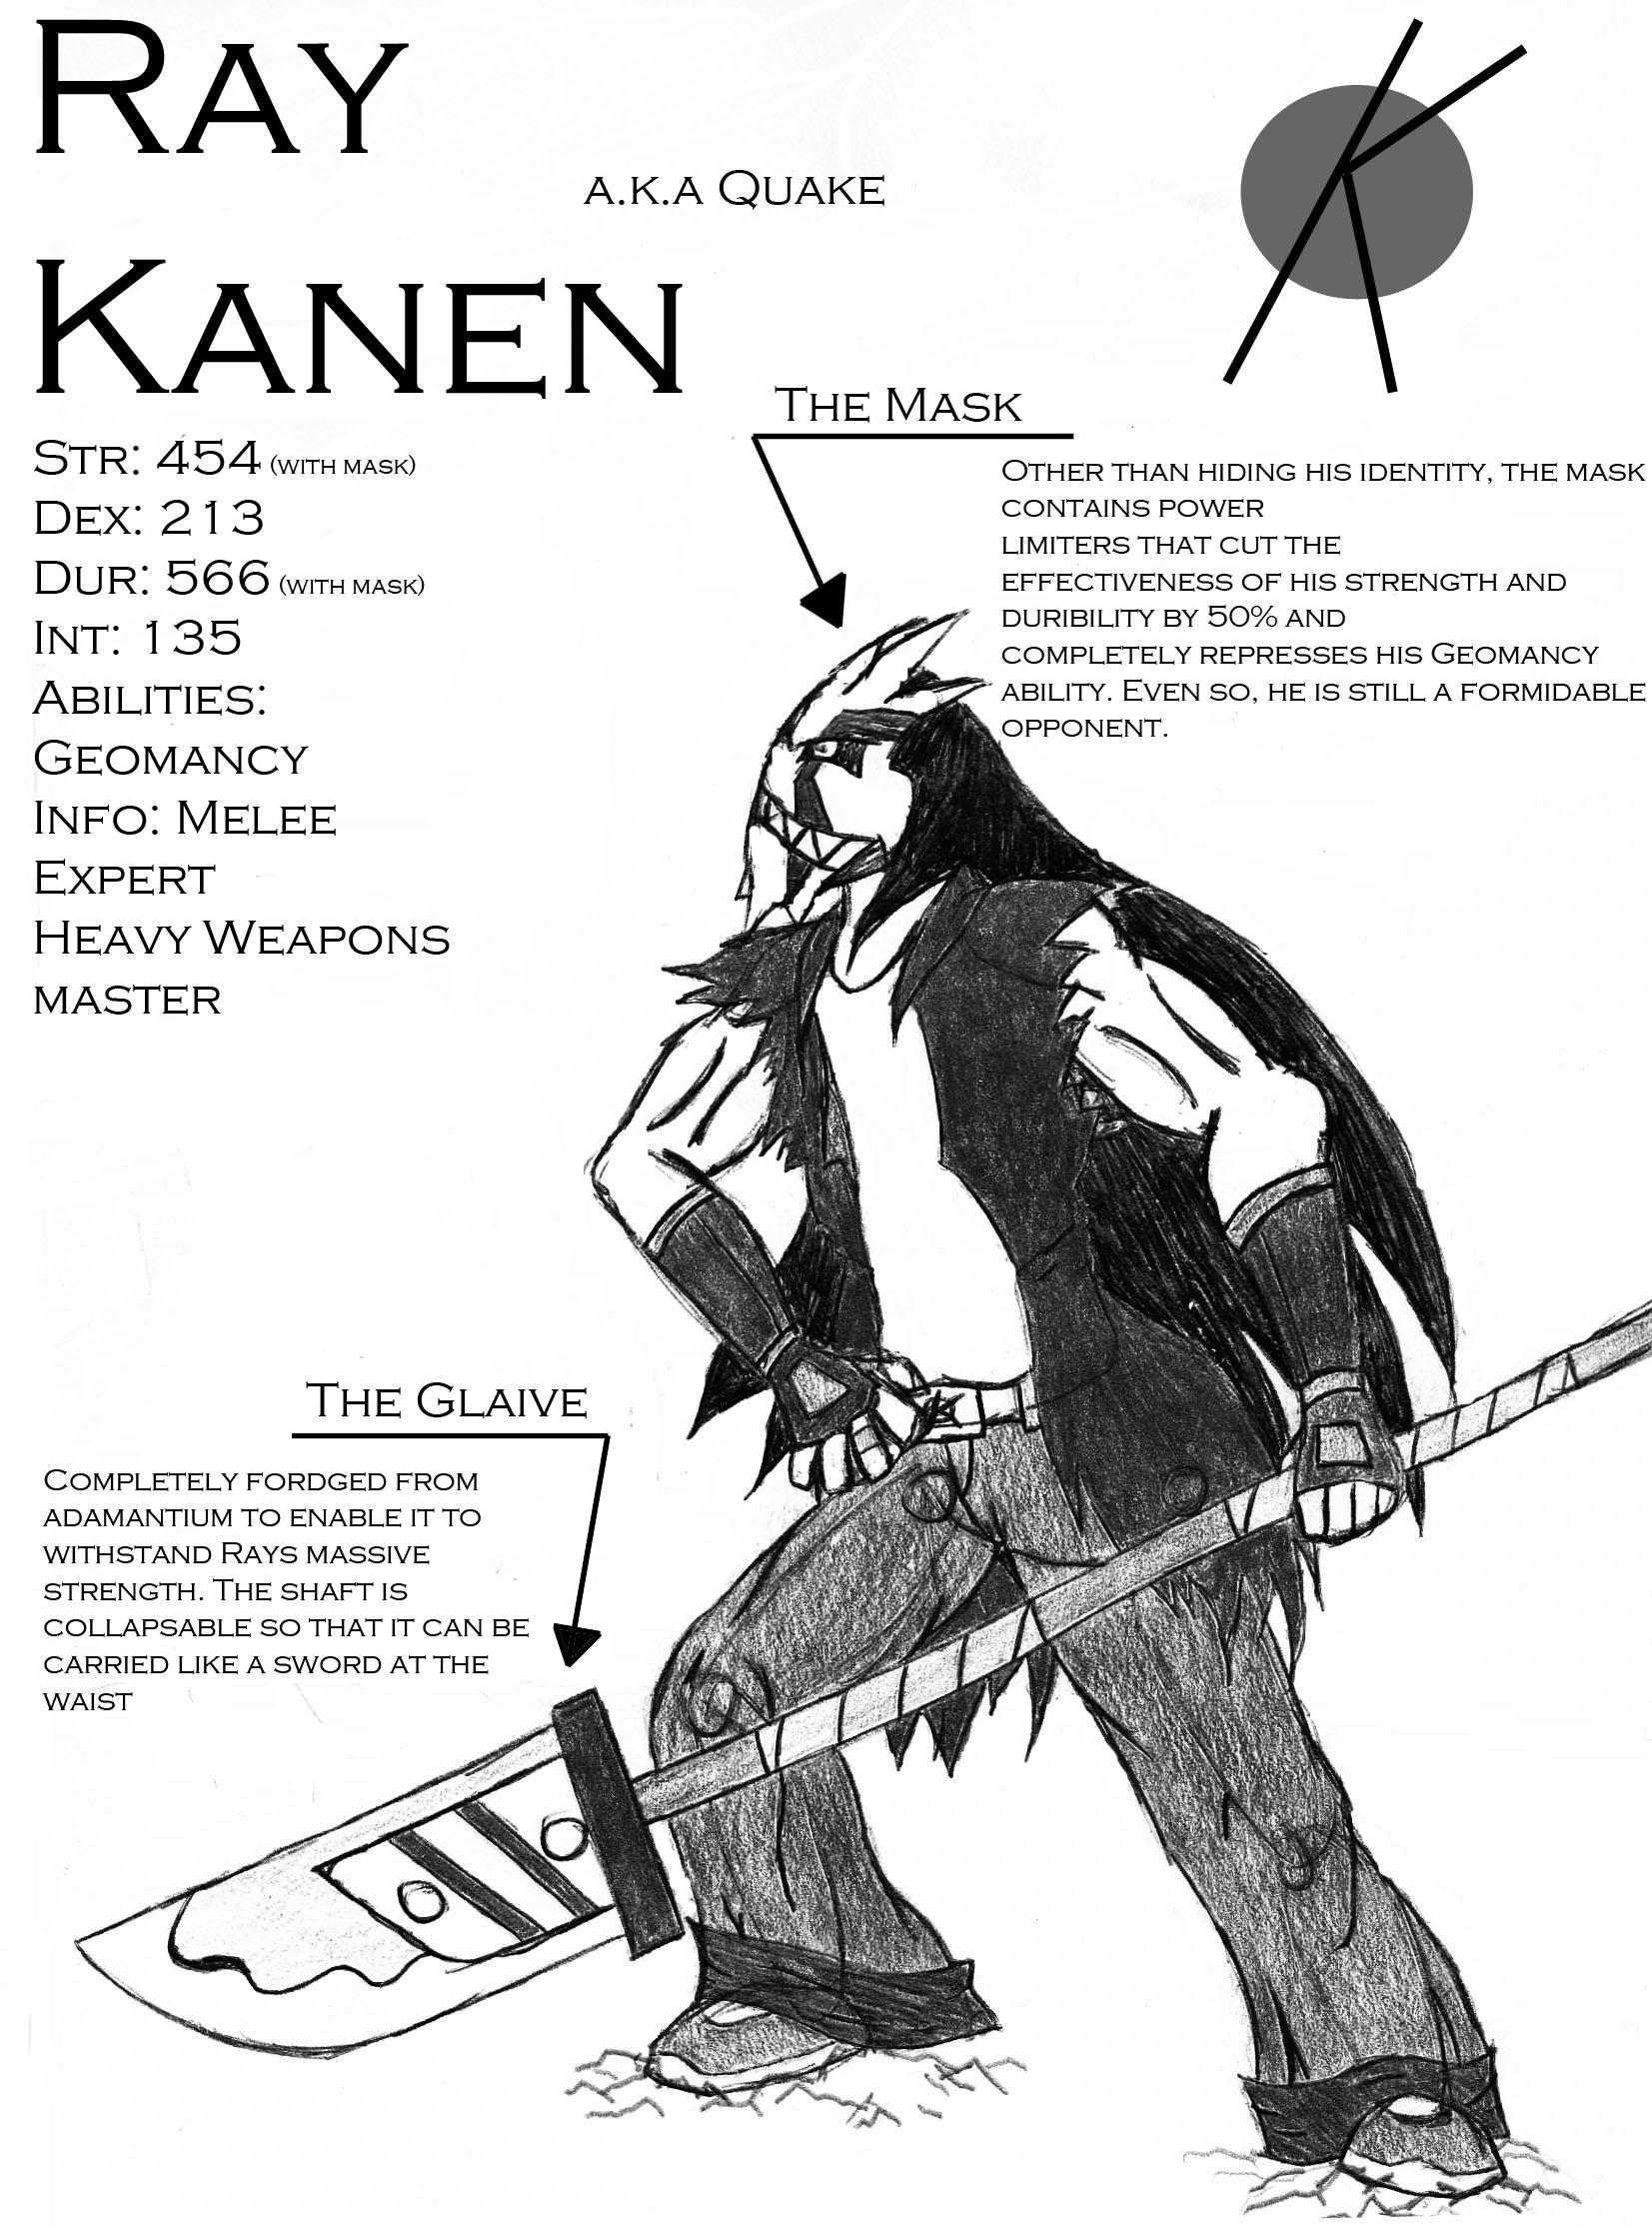 Ray Kanen